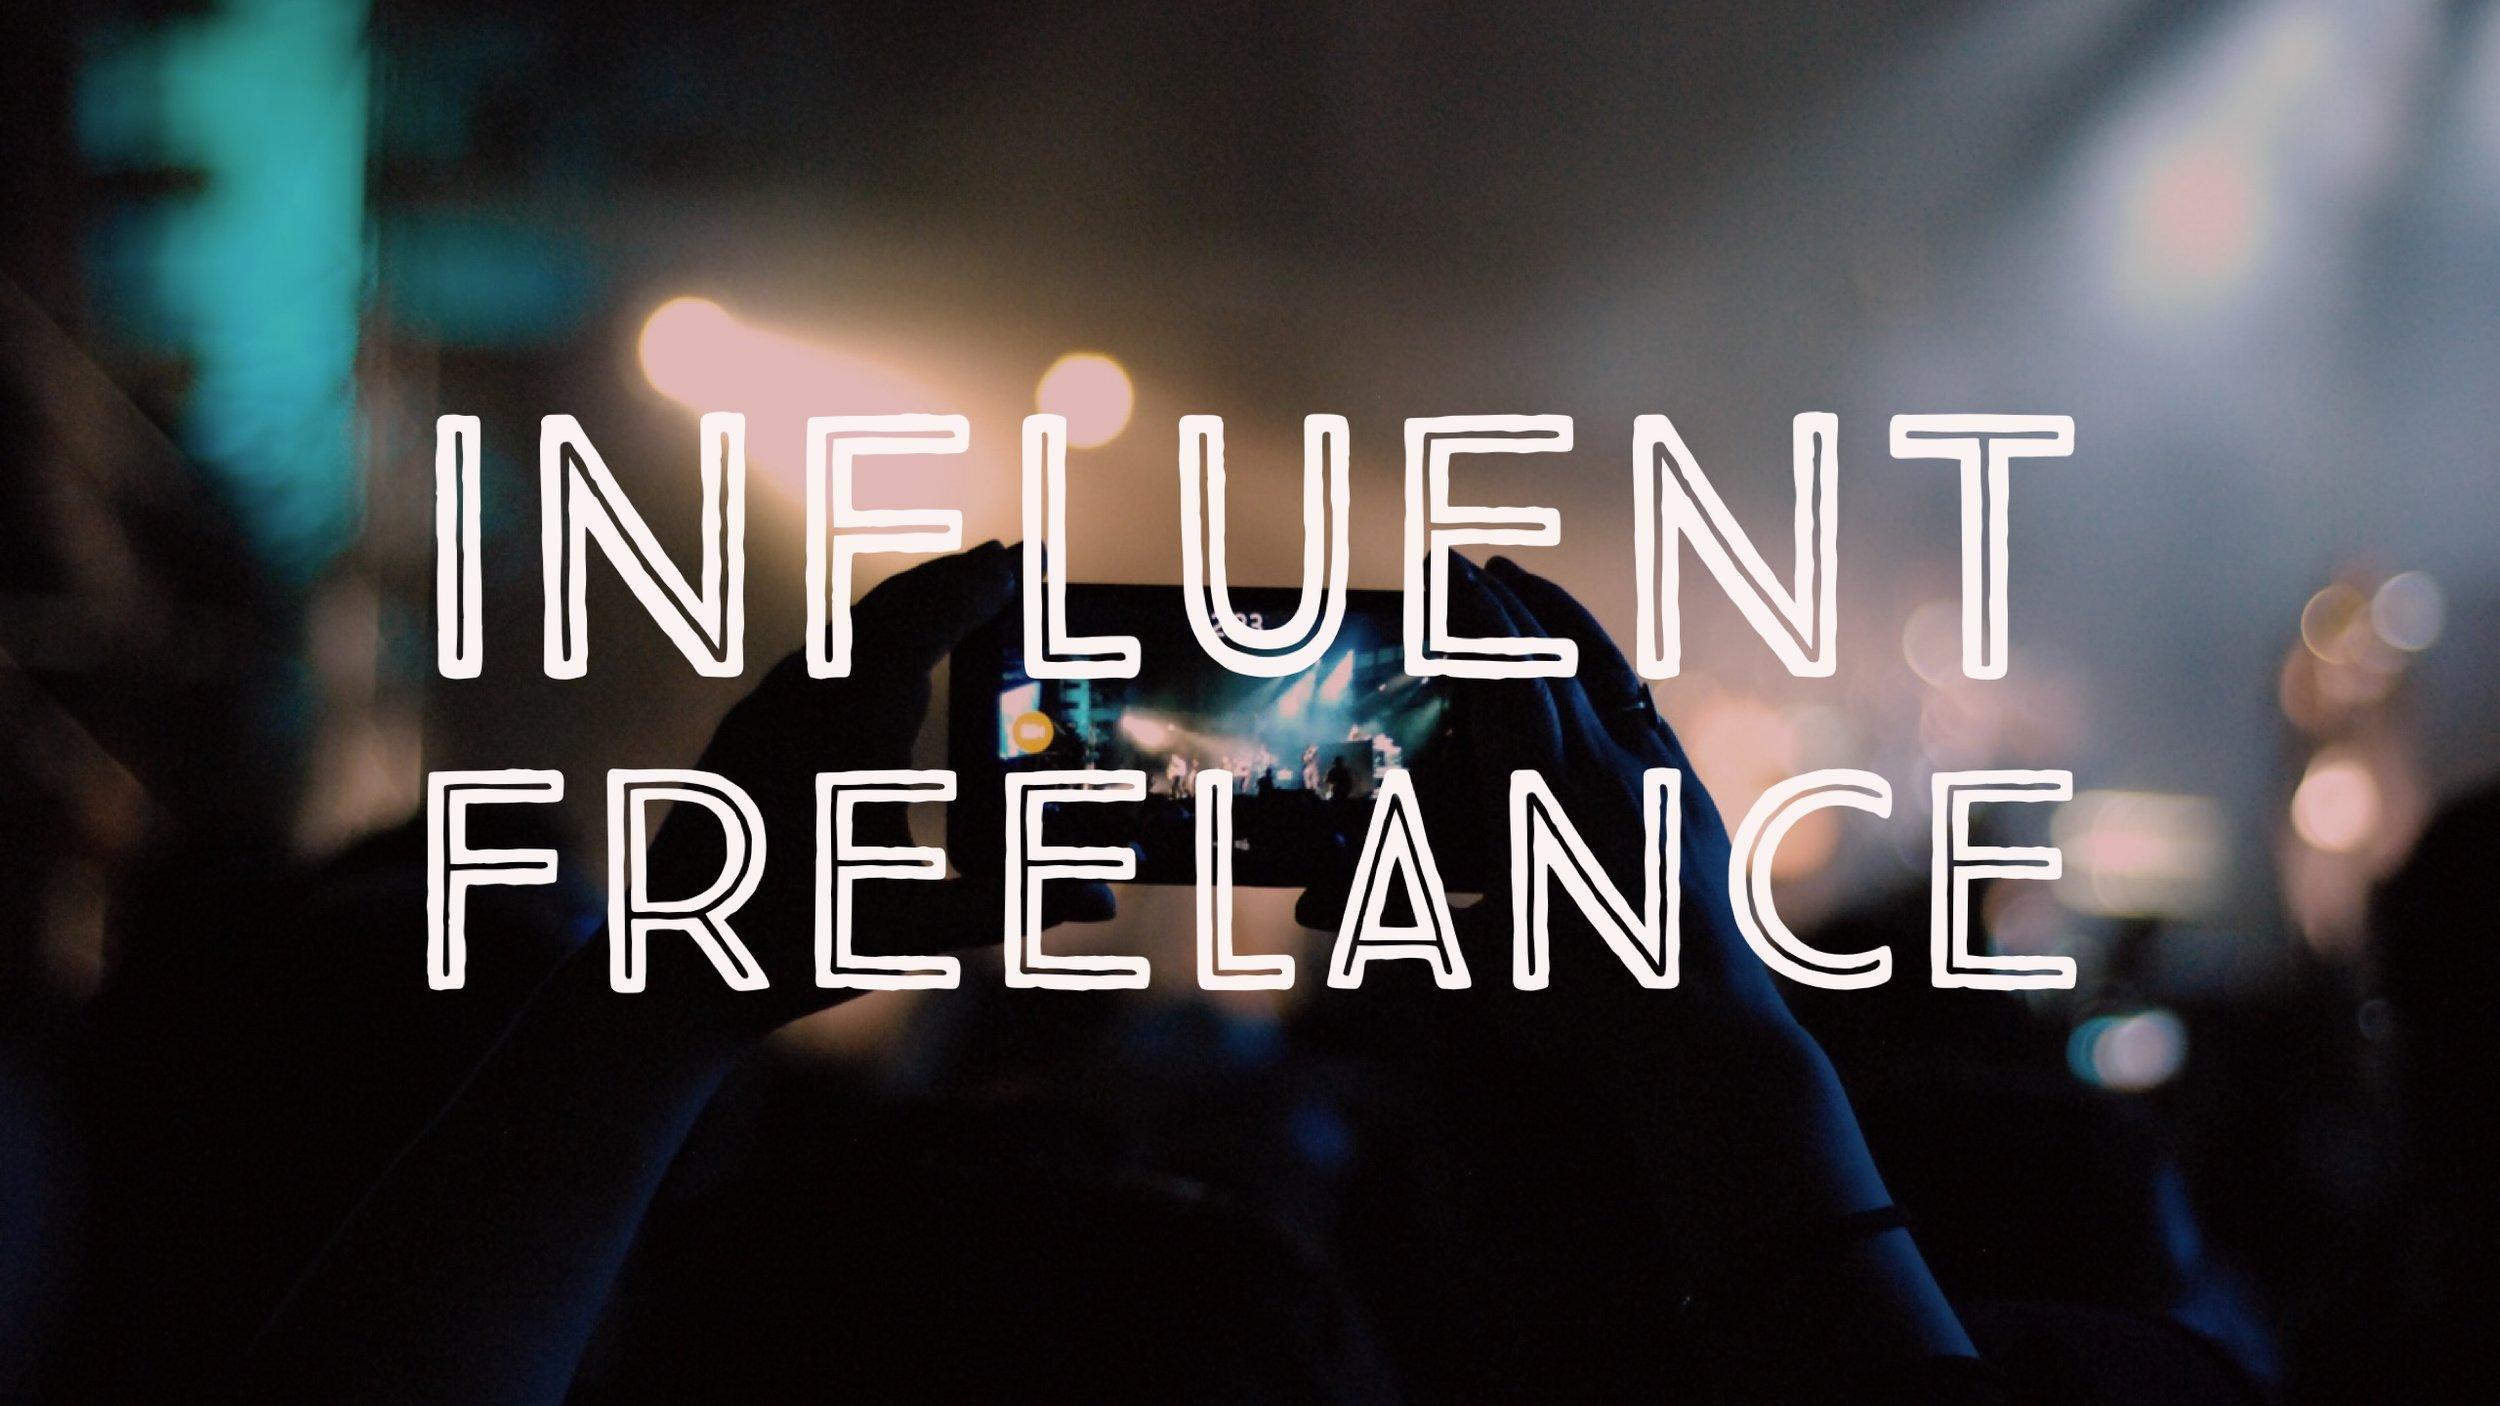 InFluent Media Freelance 4.JPG